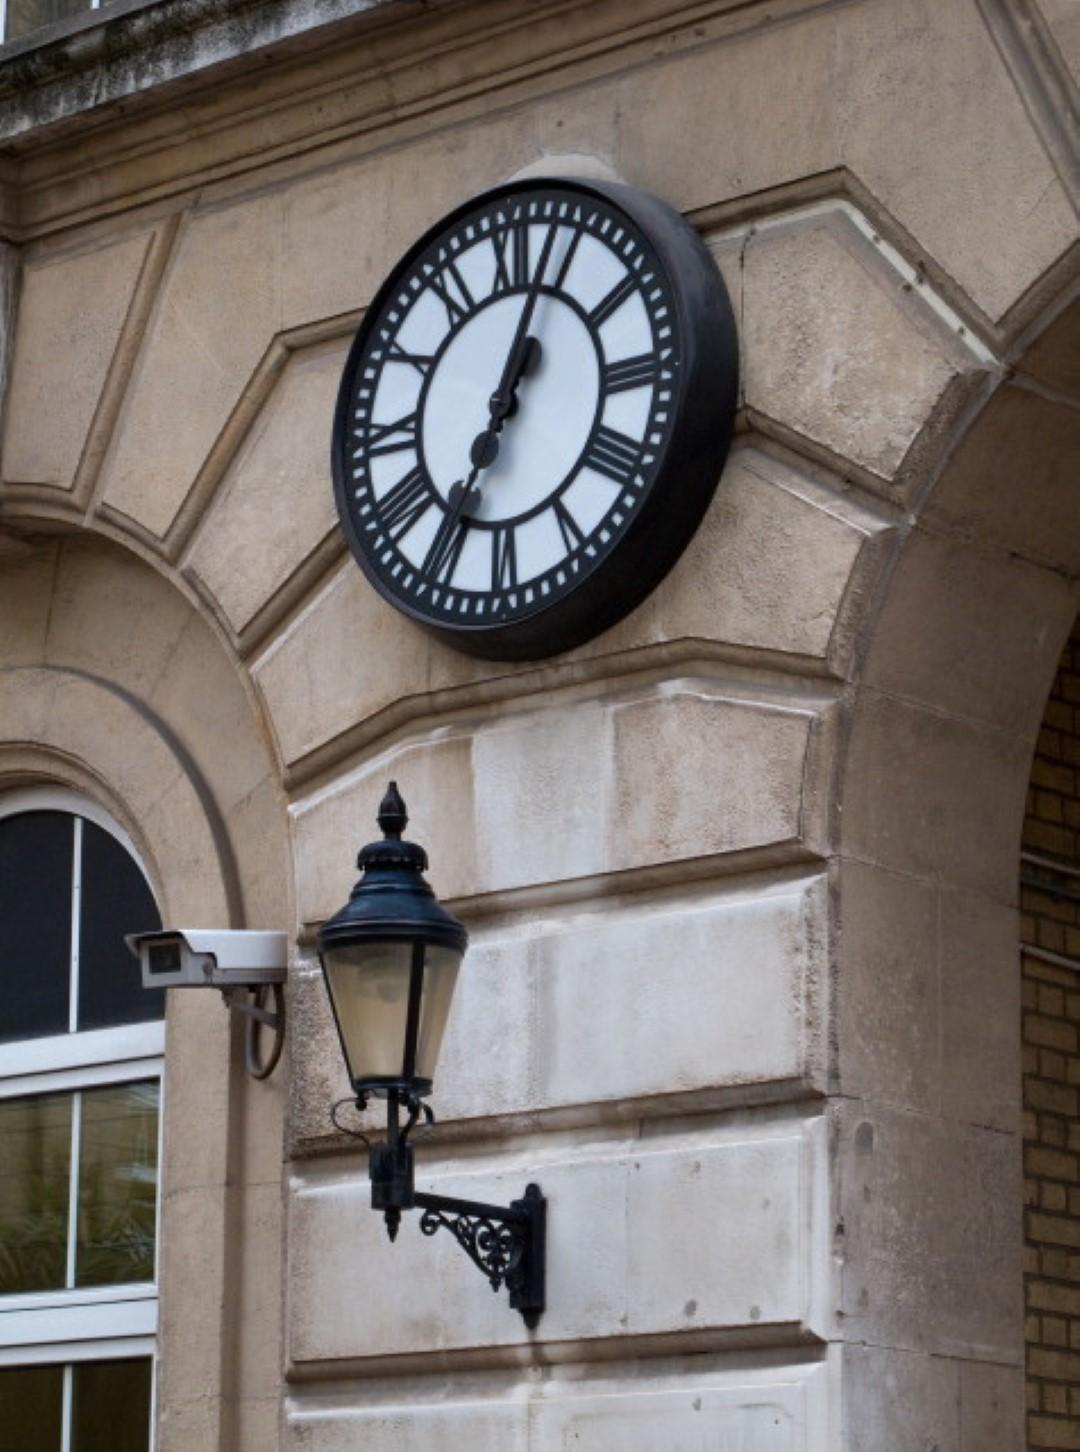 Bezel clock on hospital